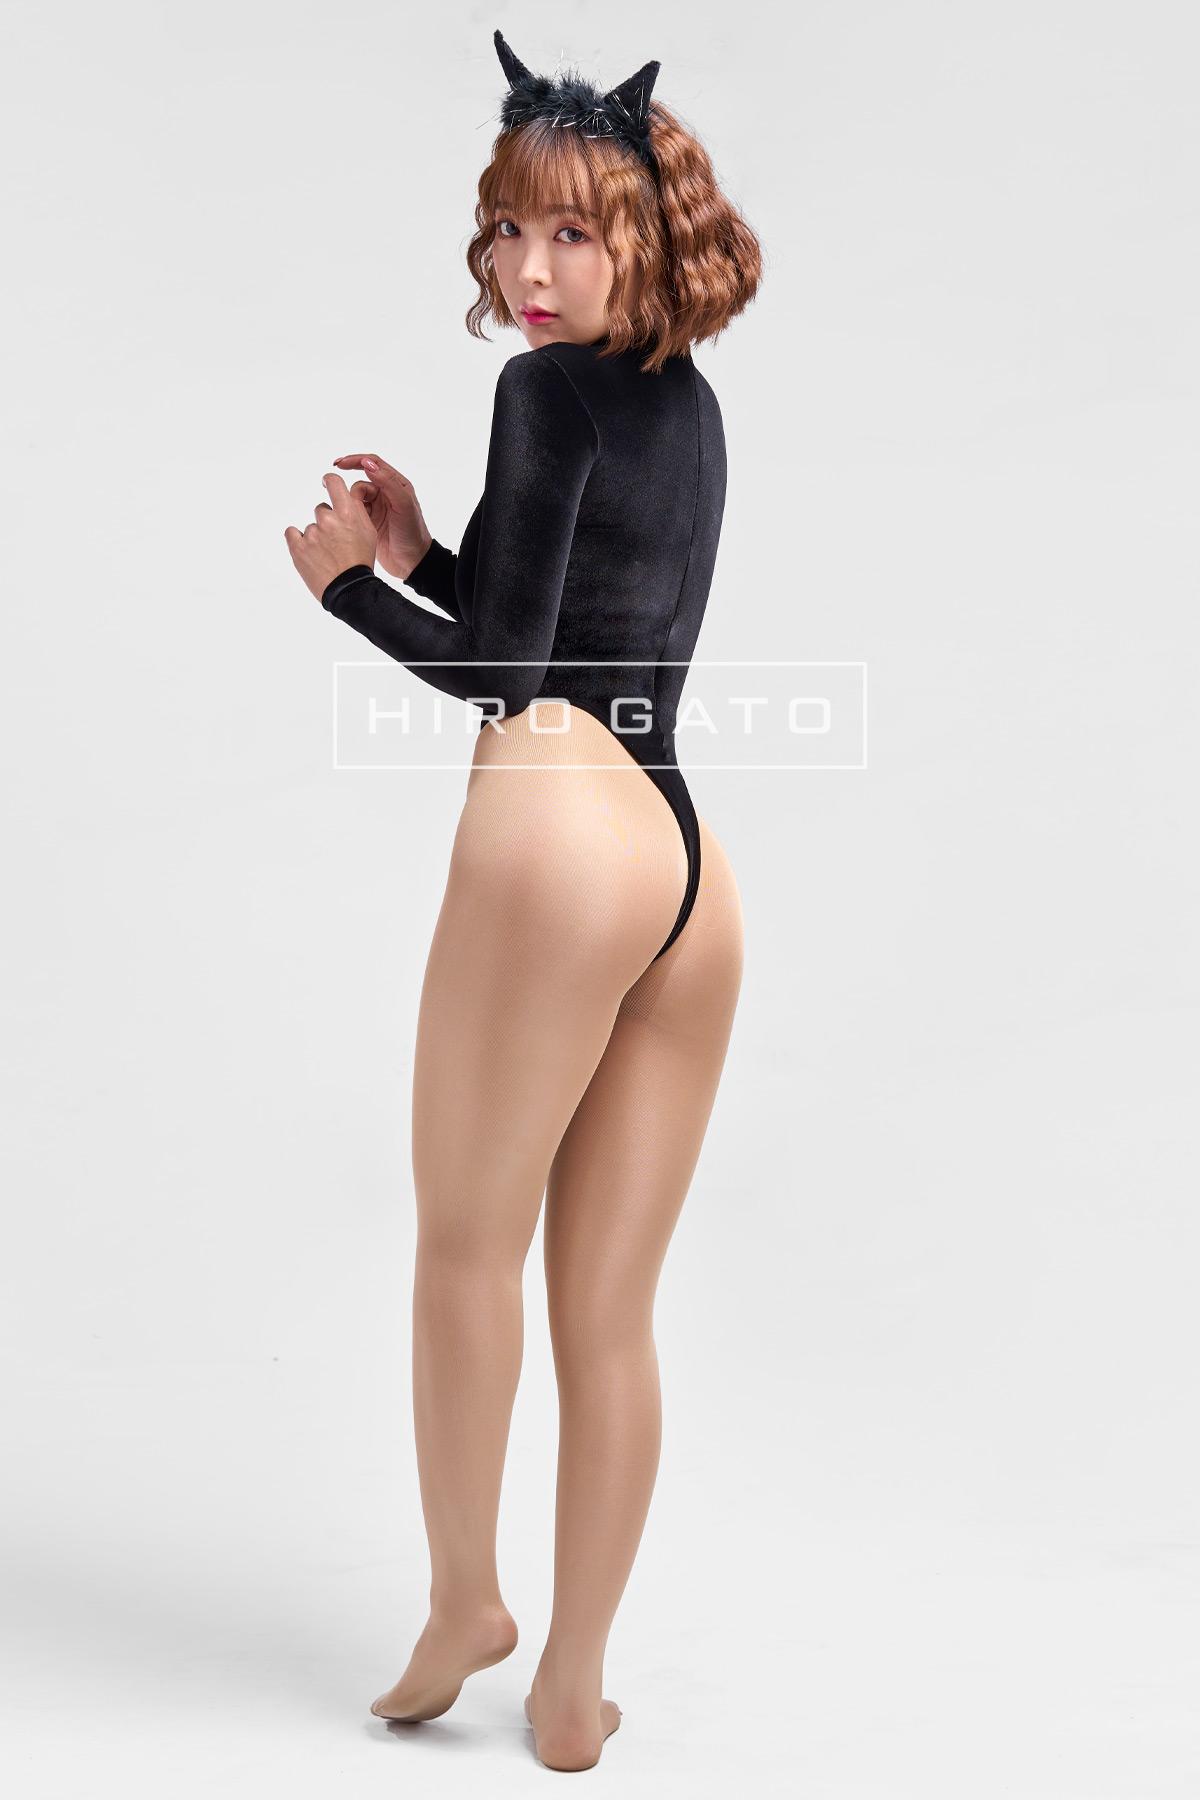 Shiny Velvet Leotard Black High Leg Spandex Lycra Body Swimsuit